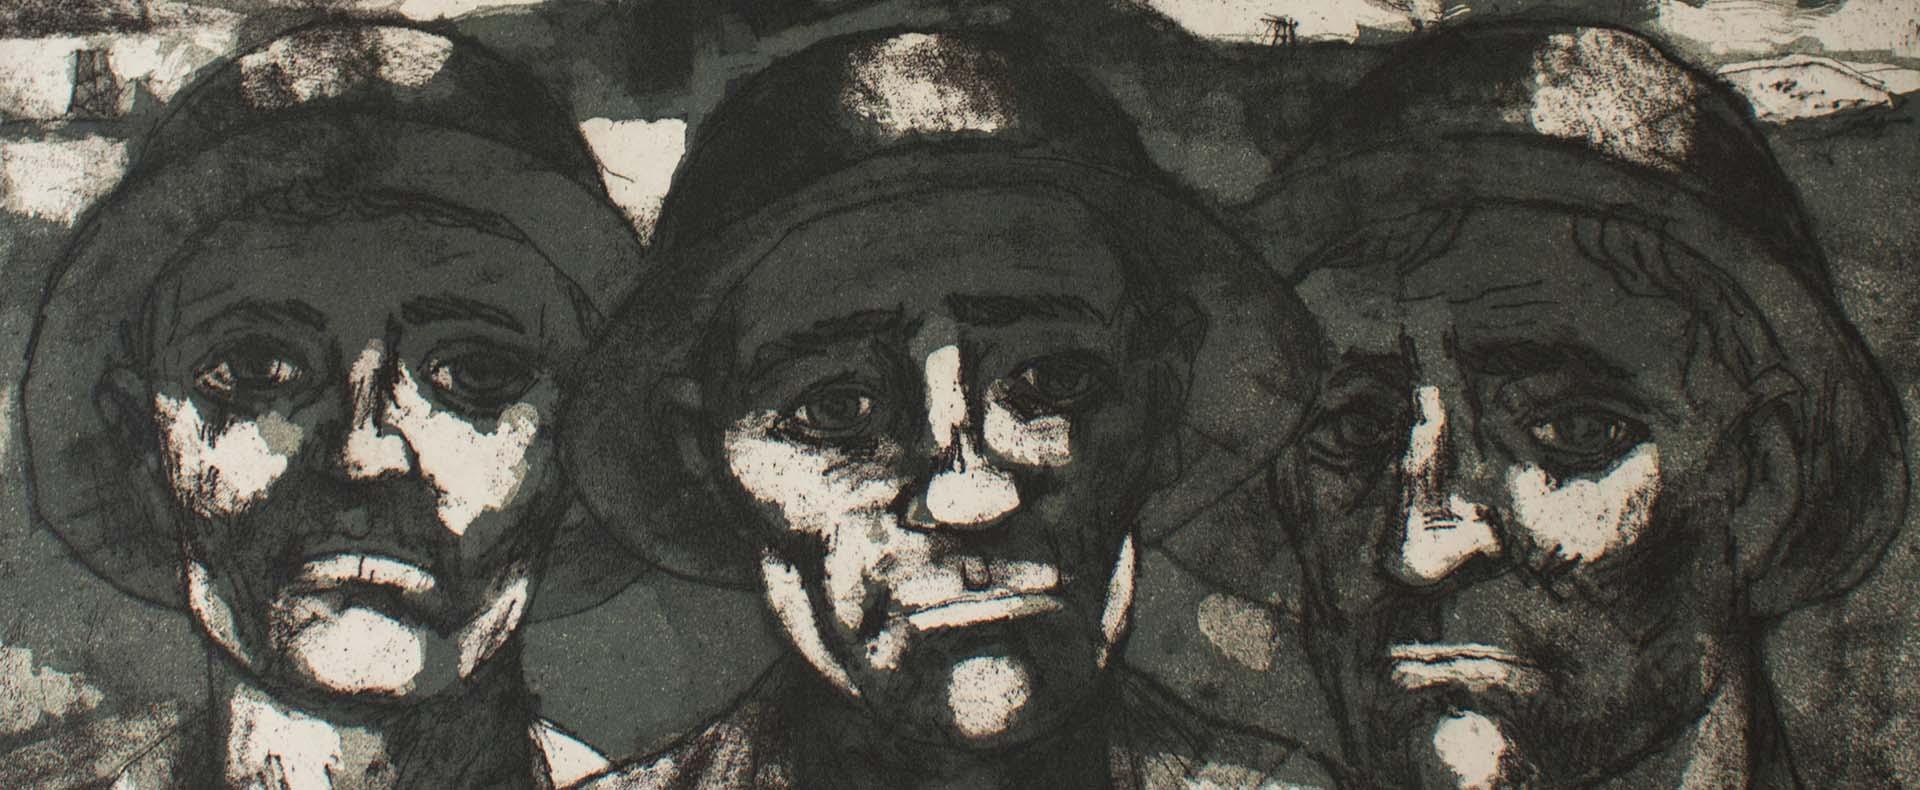 Roy Dalgarno – Labour Day